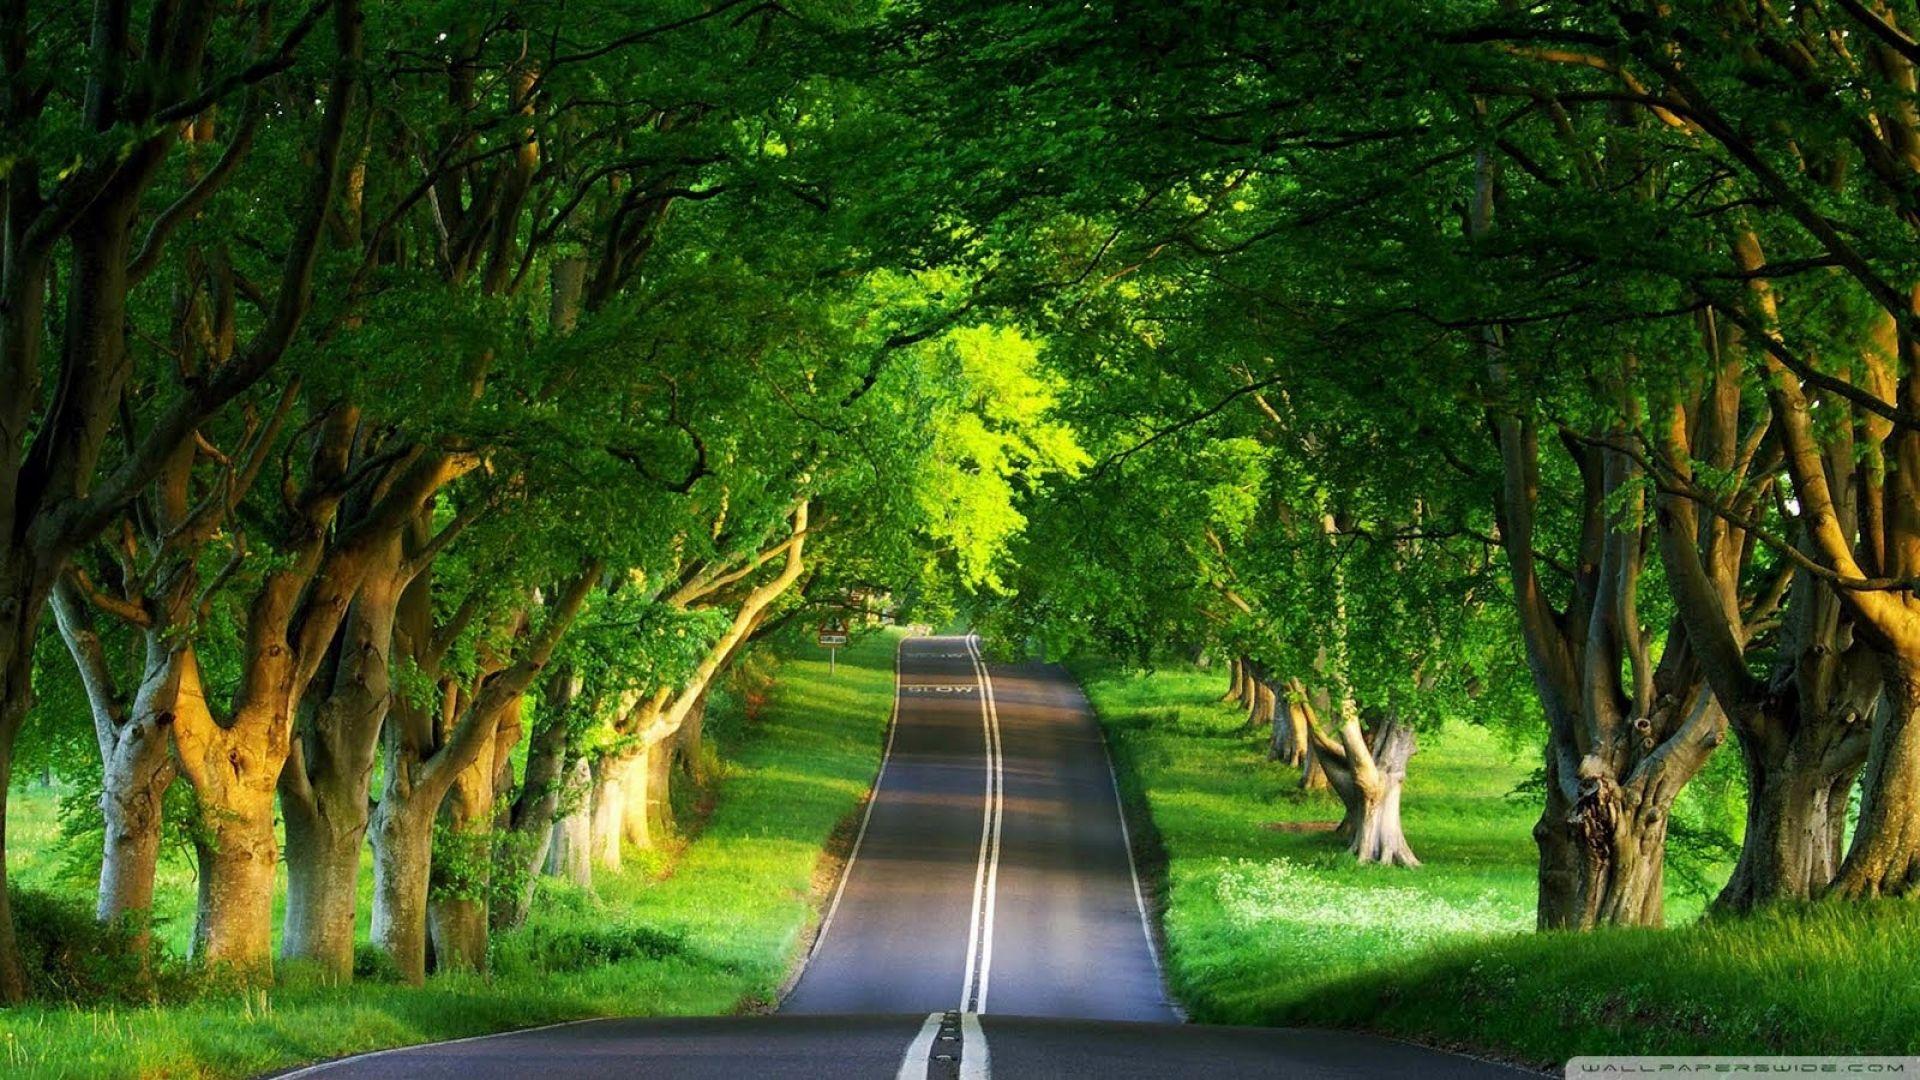 Full Hd Green Nature Wallpaper